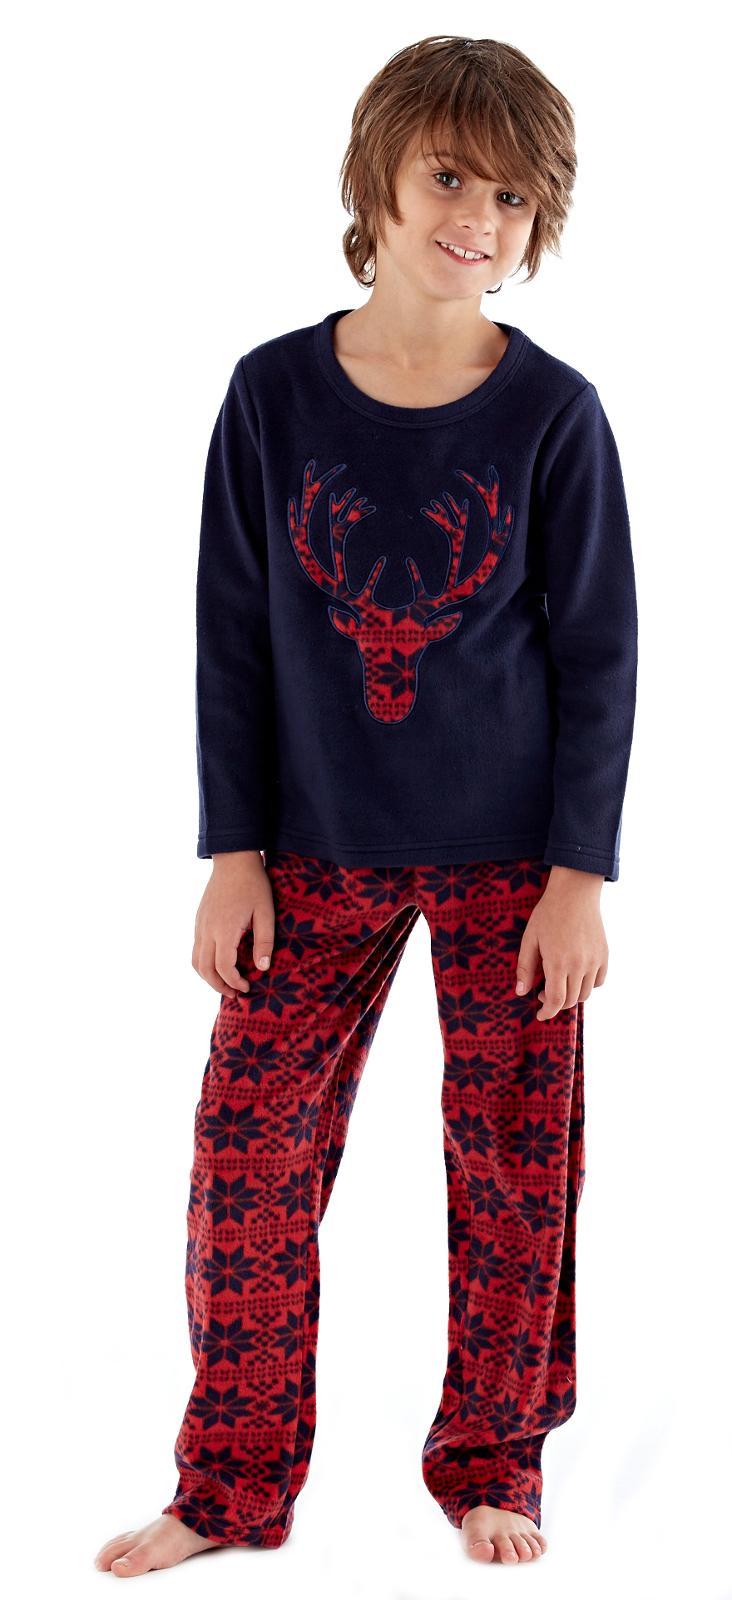 Boys Fleece Pyjamas Mini Me Lounge Set Soft Twosie Pjs Nightwear Xmas Gift  Size   eBay